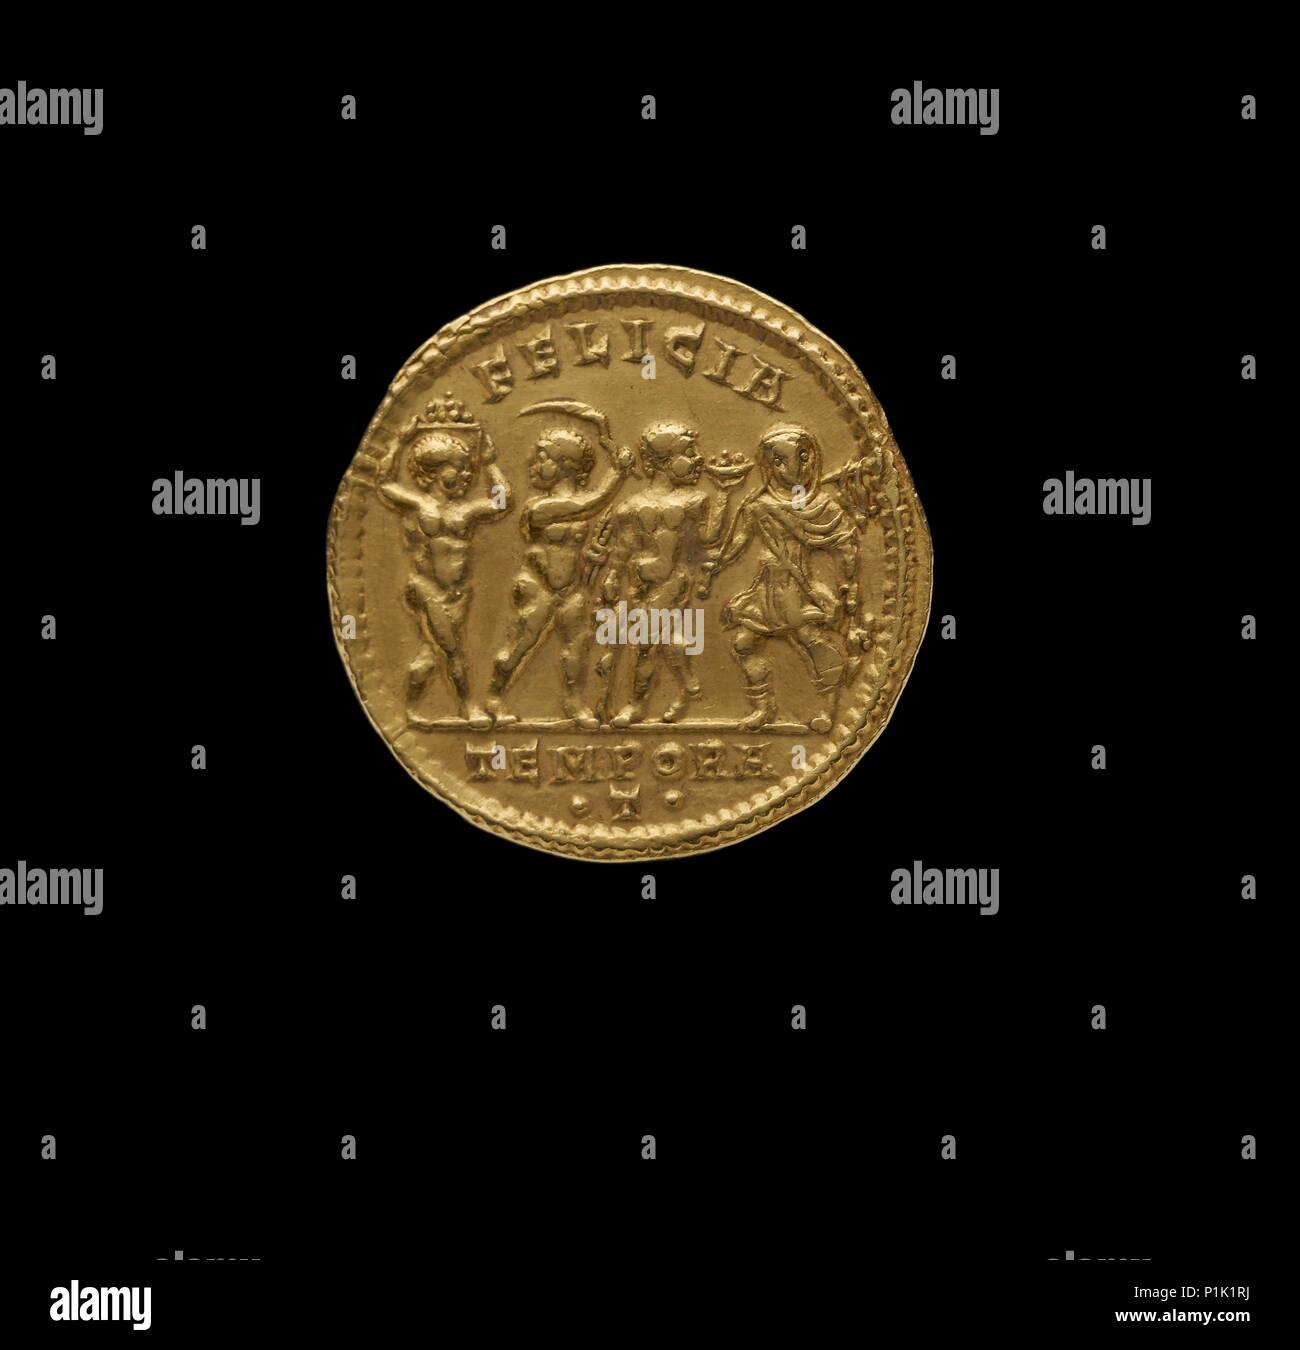 e2960d17f4 Imperiale romana moneta, 316. Dimensioni: diametro: 19 mmweight: 4.28 gdie-